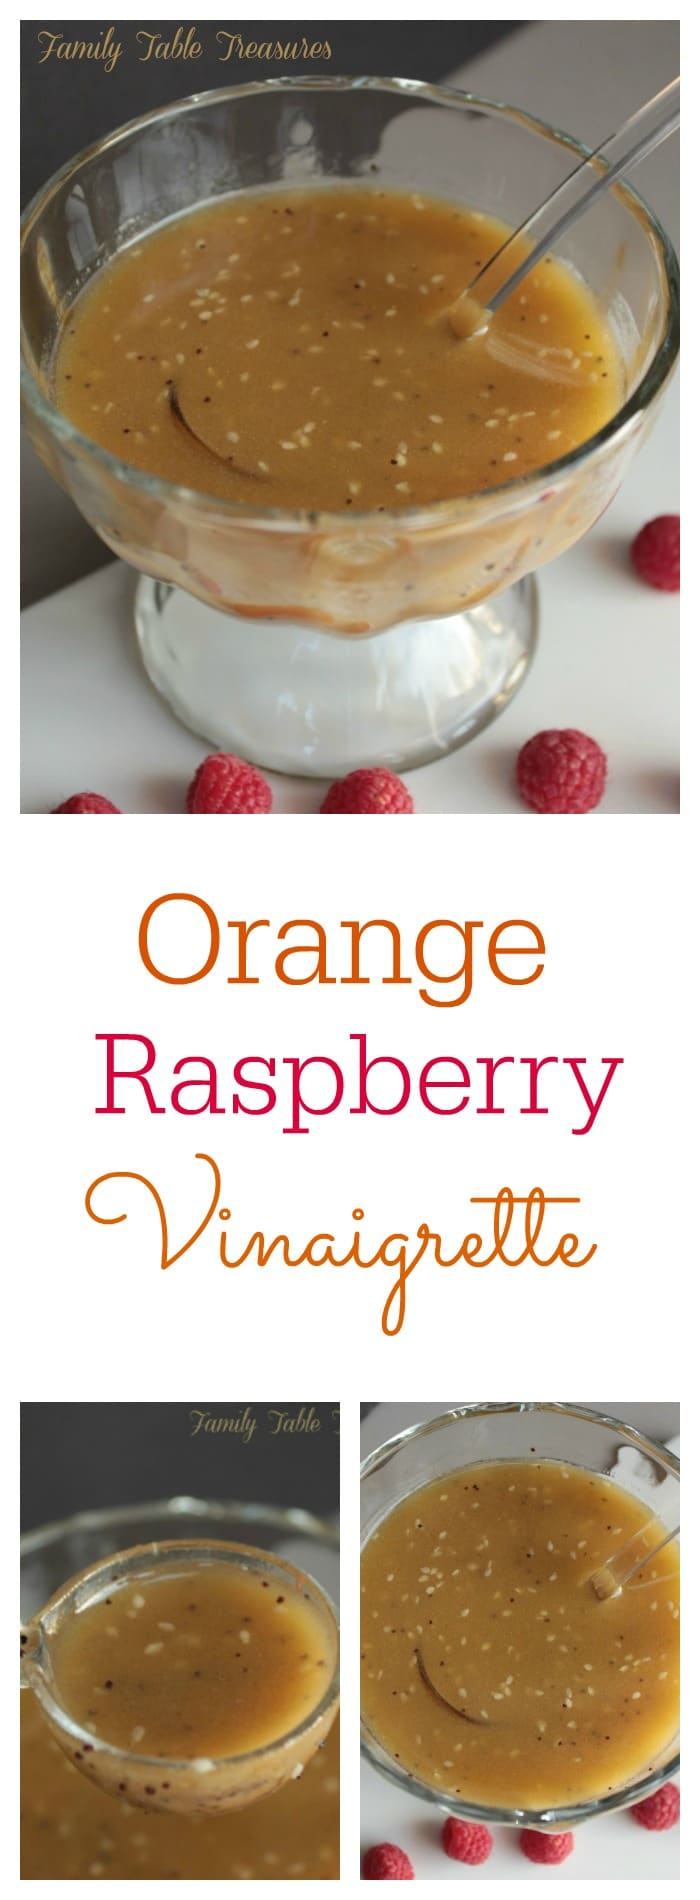 Orange Raspberry Vinaigrette